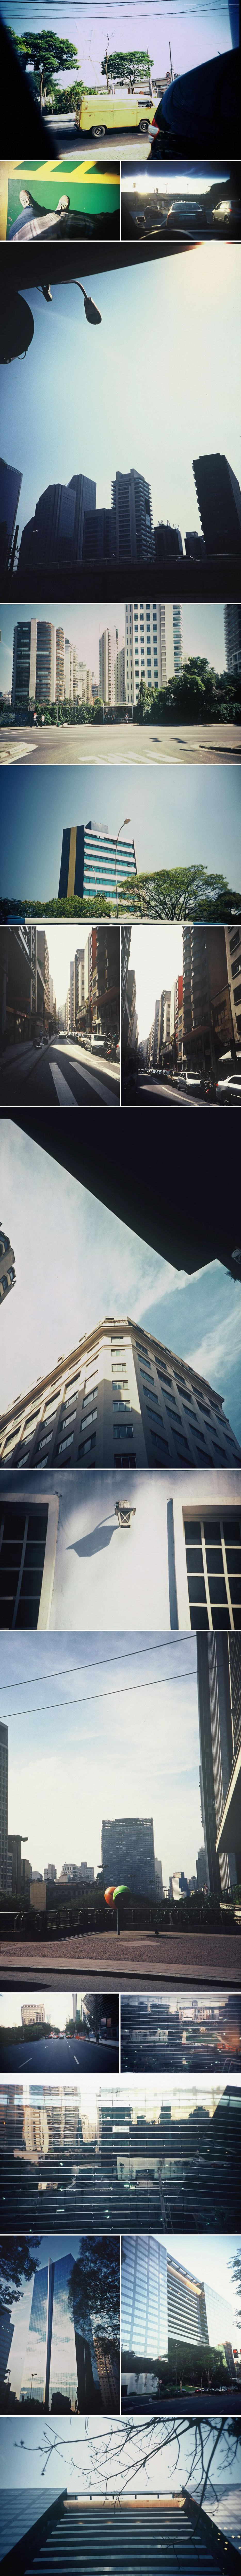 desabafos-fotograficos-e100vs.jpg